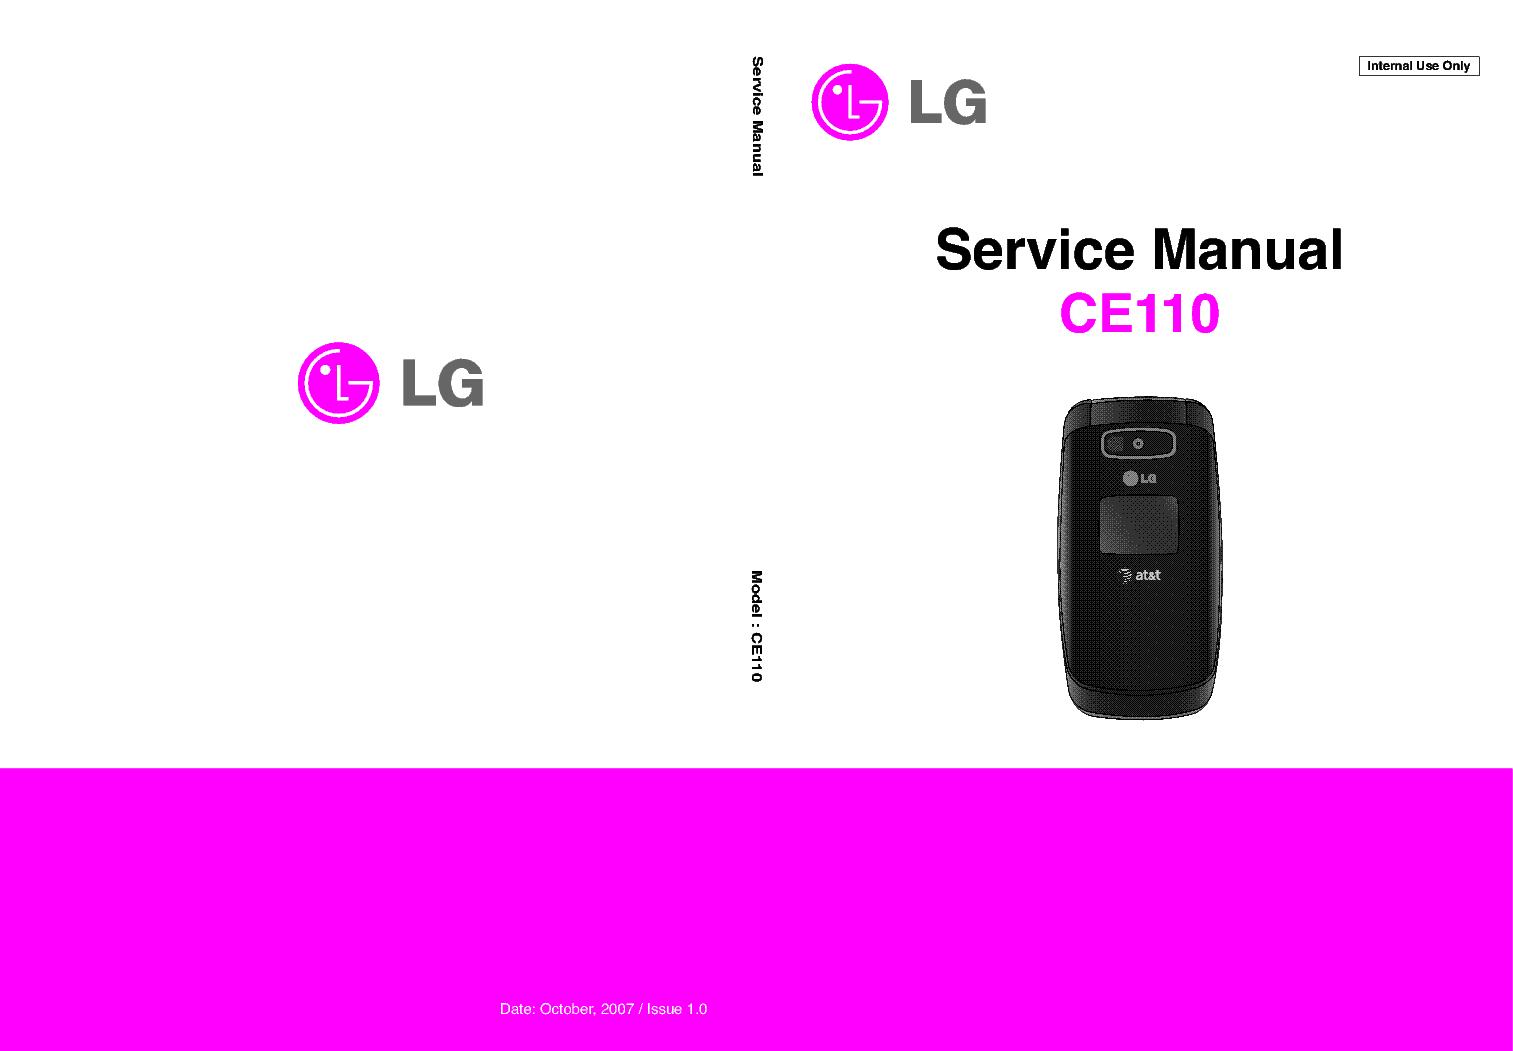 lg ce110 sm service manual download schematics eeprom repair info rh elektrotanya com Unlock LG CE110 AT&T LG Phones